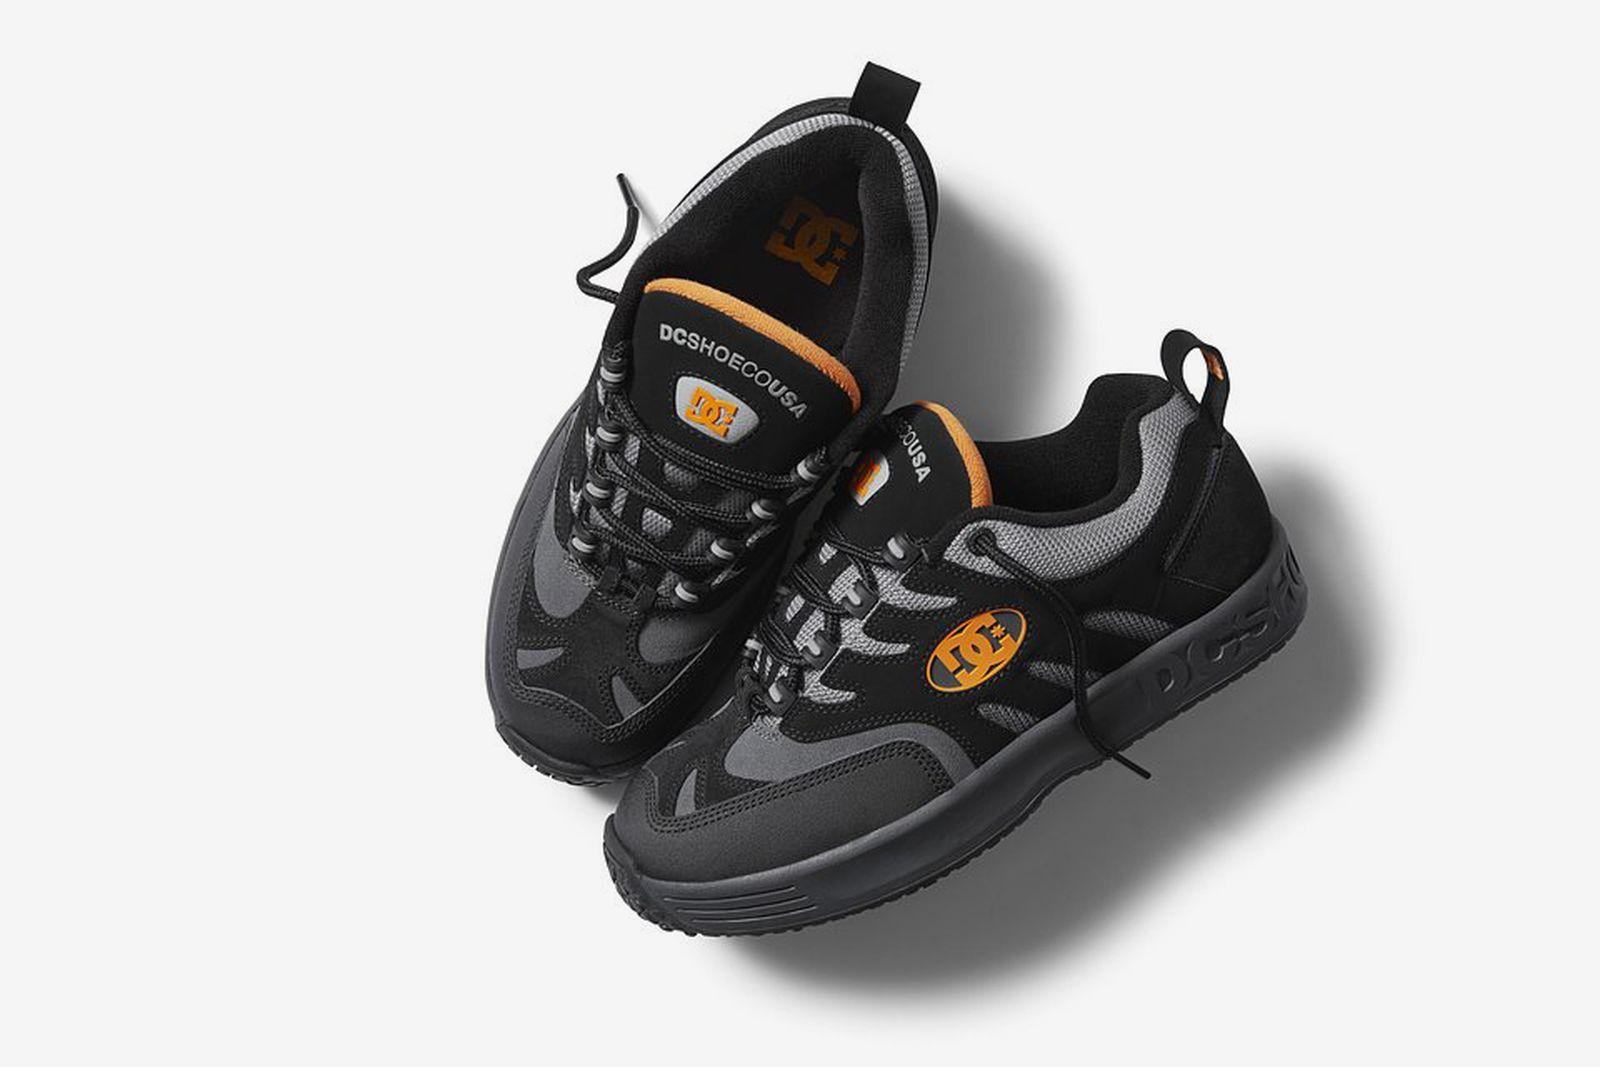 dc-shoes-lukoda-og-black-charcoal-release-date-price-02